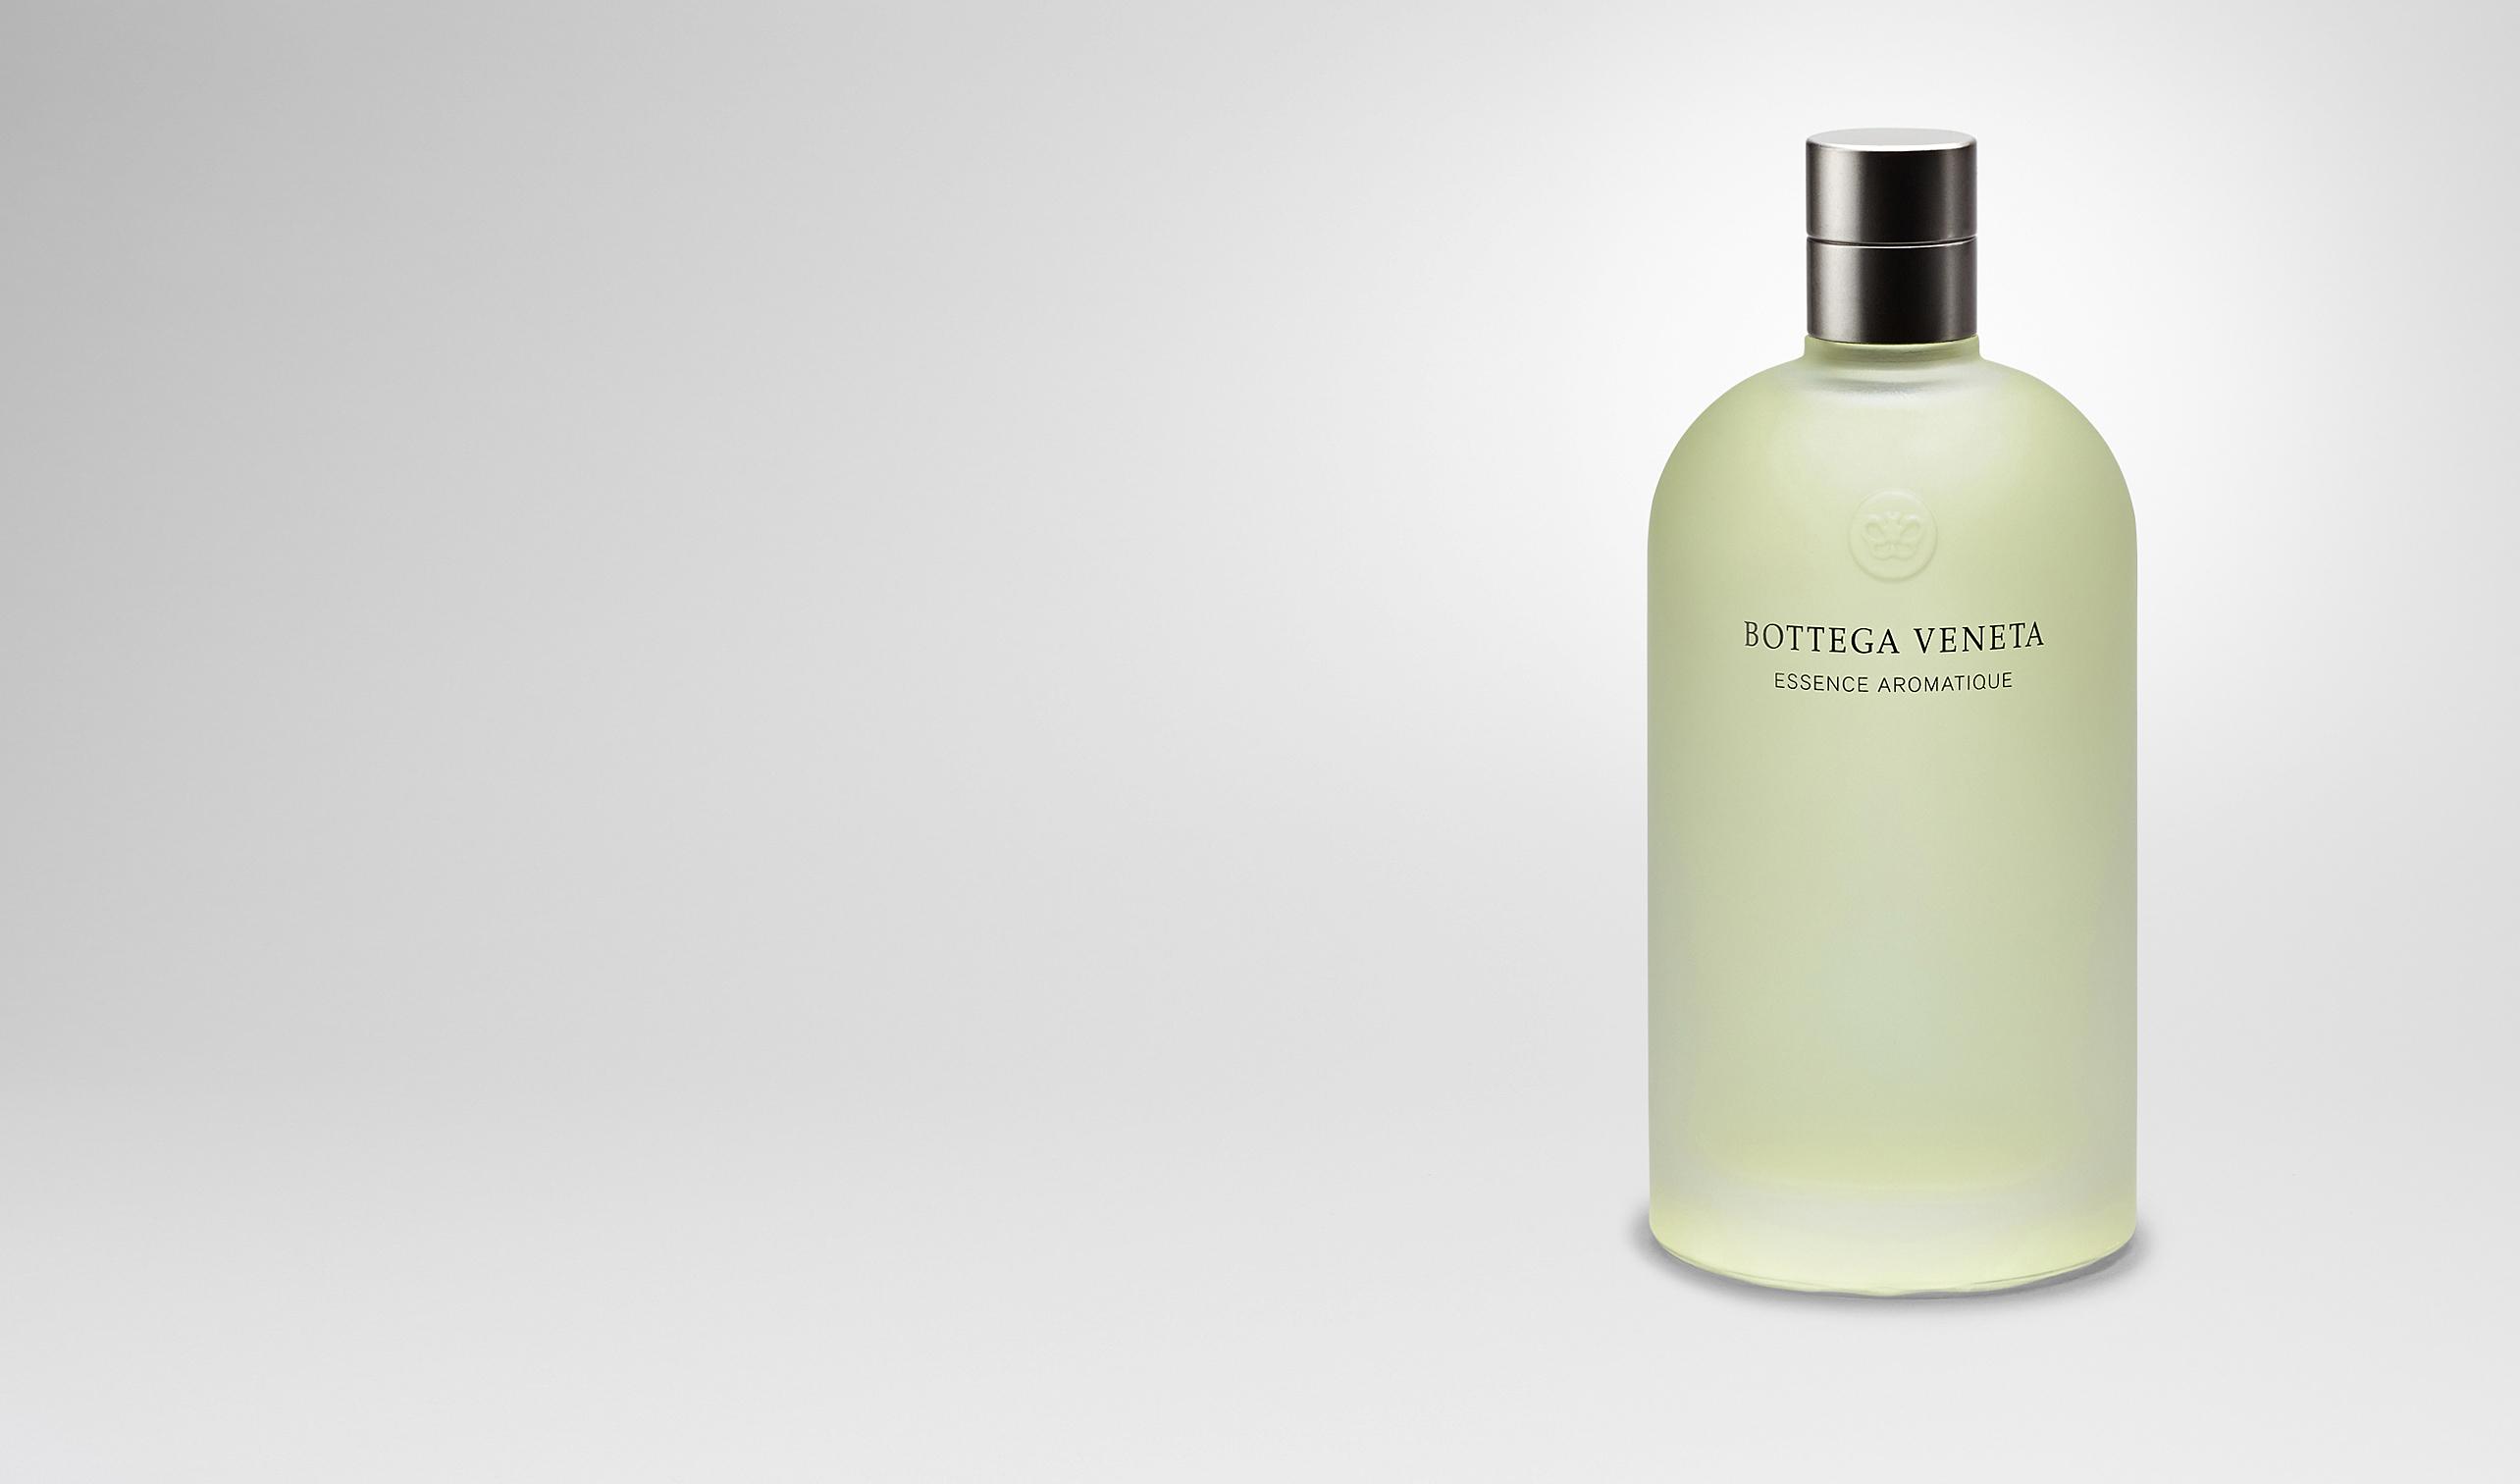 BOTTEGA VENETA Parfum D BOTTEGA VENETA ESSENCE AROMATIQUE 200 ML pl